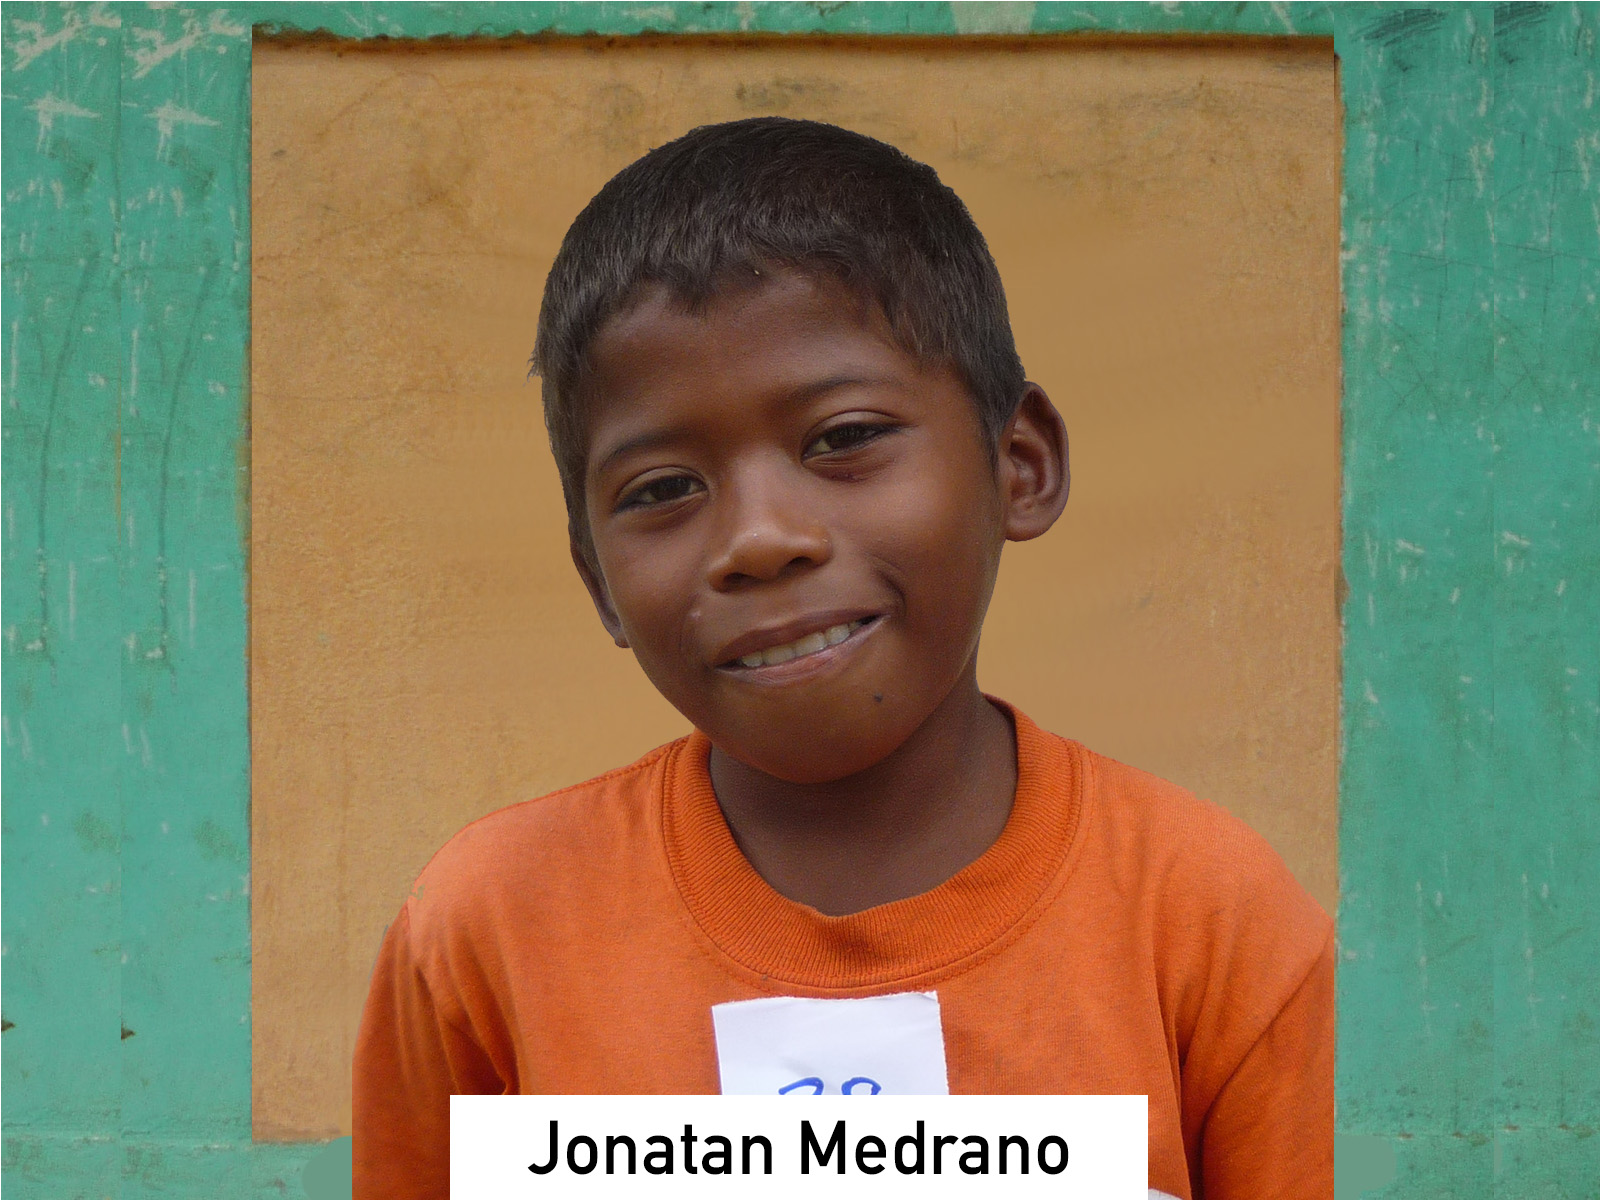 038 - Jonatan Medrano.jpg